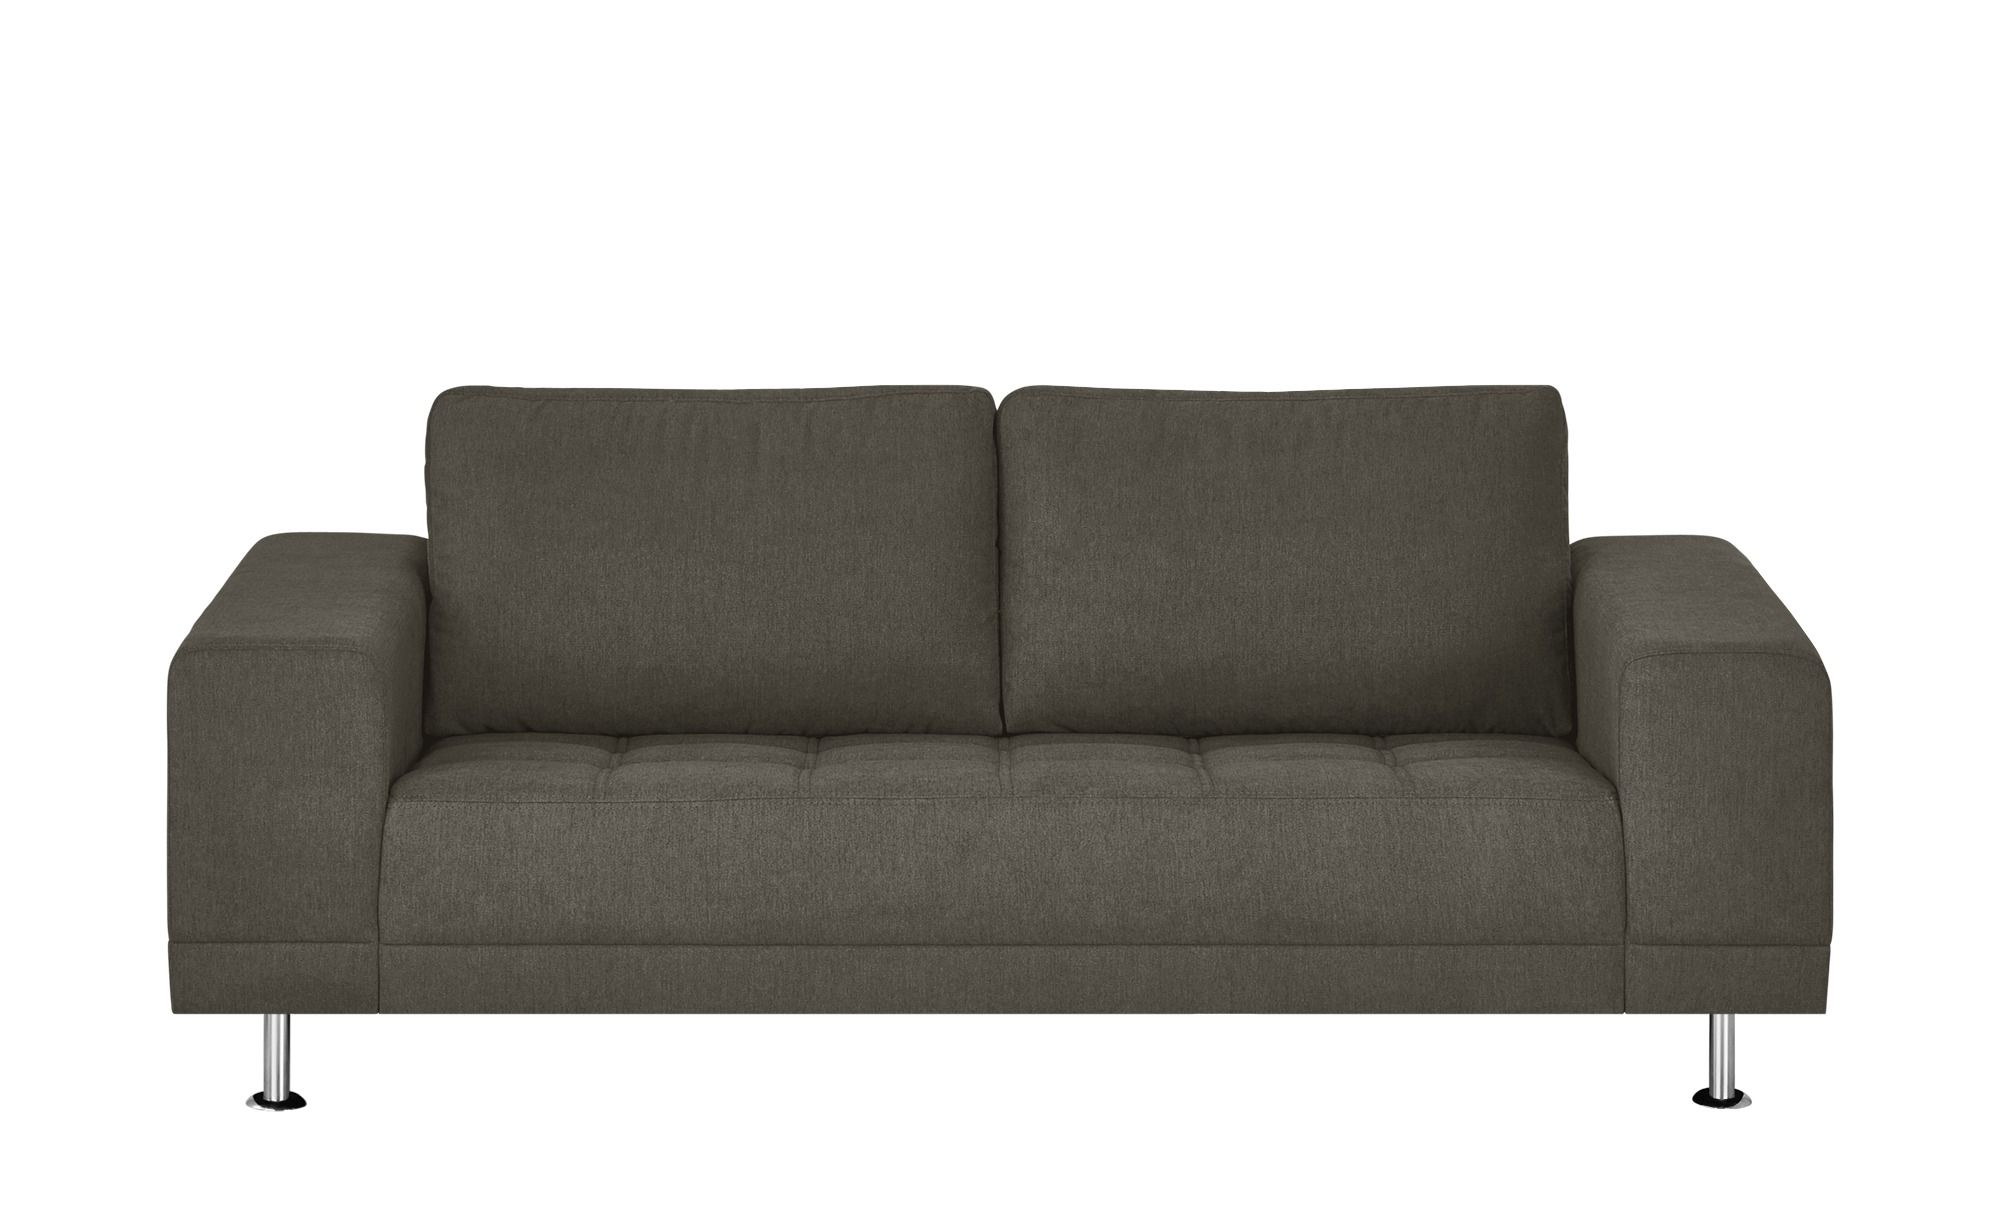 Smart Sofa Grau Flachgewebe Garda Grau Masse Cm B 200 H 85 T 93 Polstermobel Sofas 2 Sitzer Hoffner Jetzt Bestellen Unt Sofa Graues Sofa Sofas